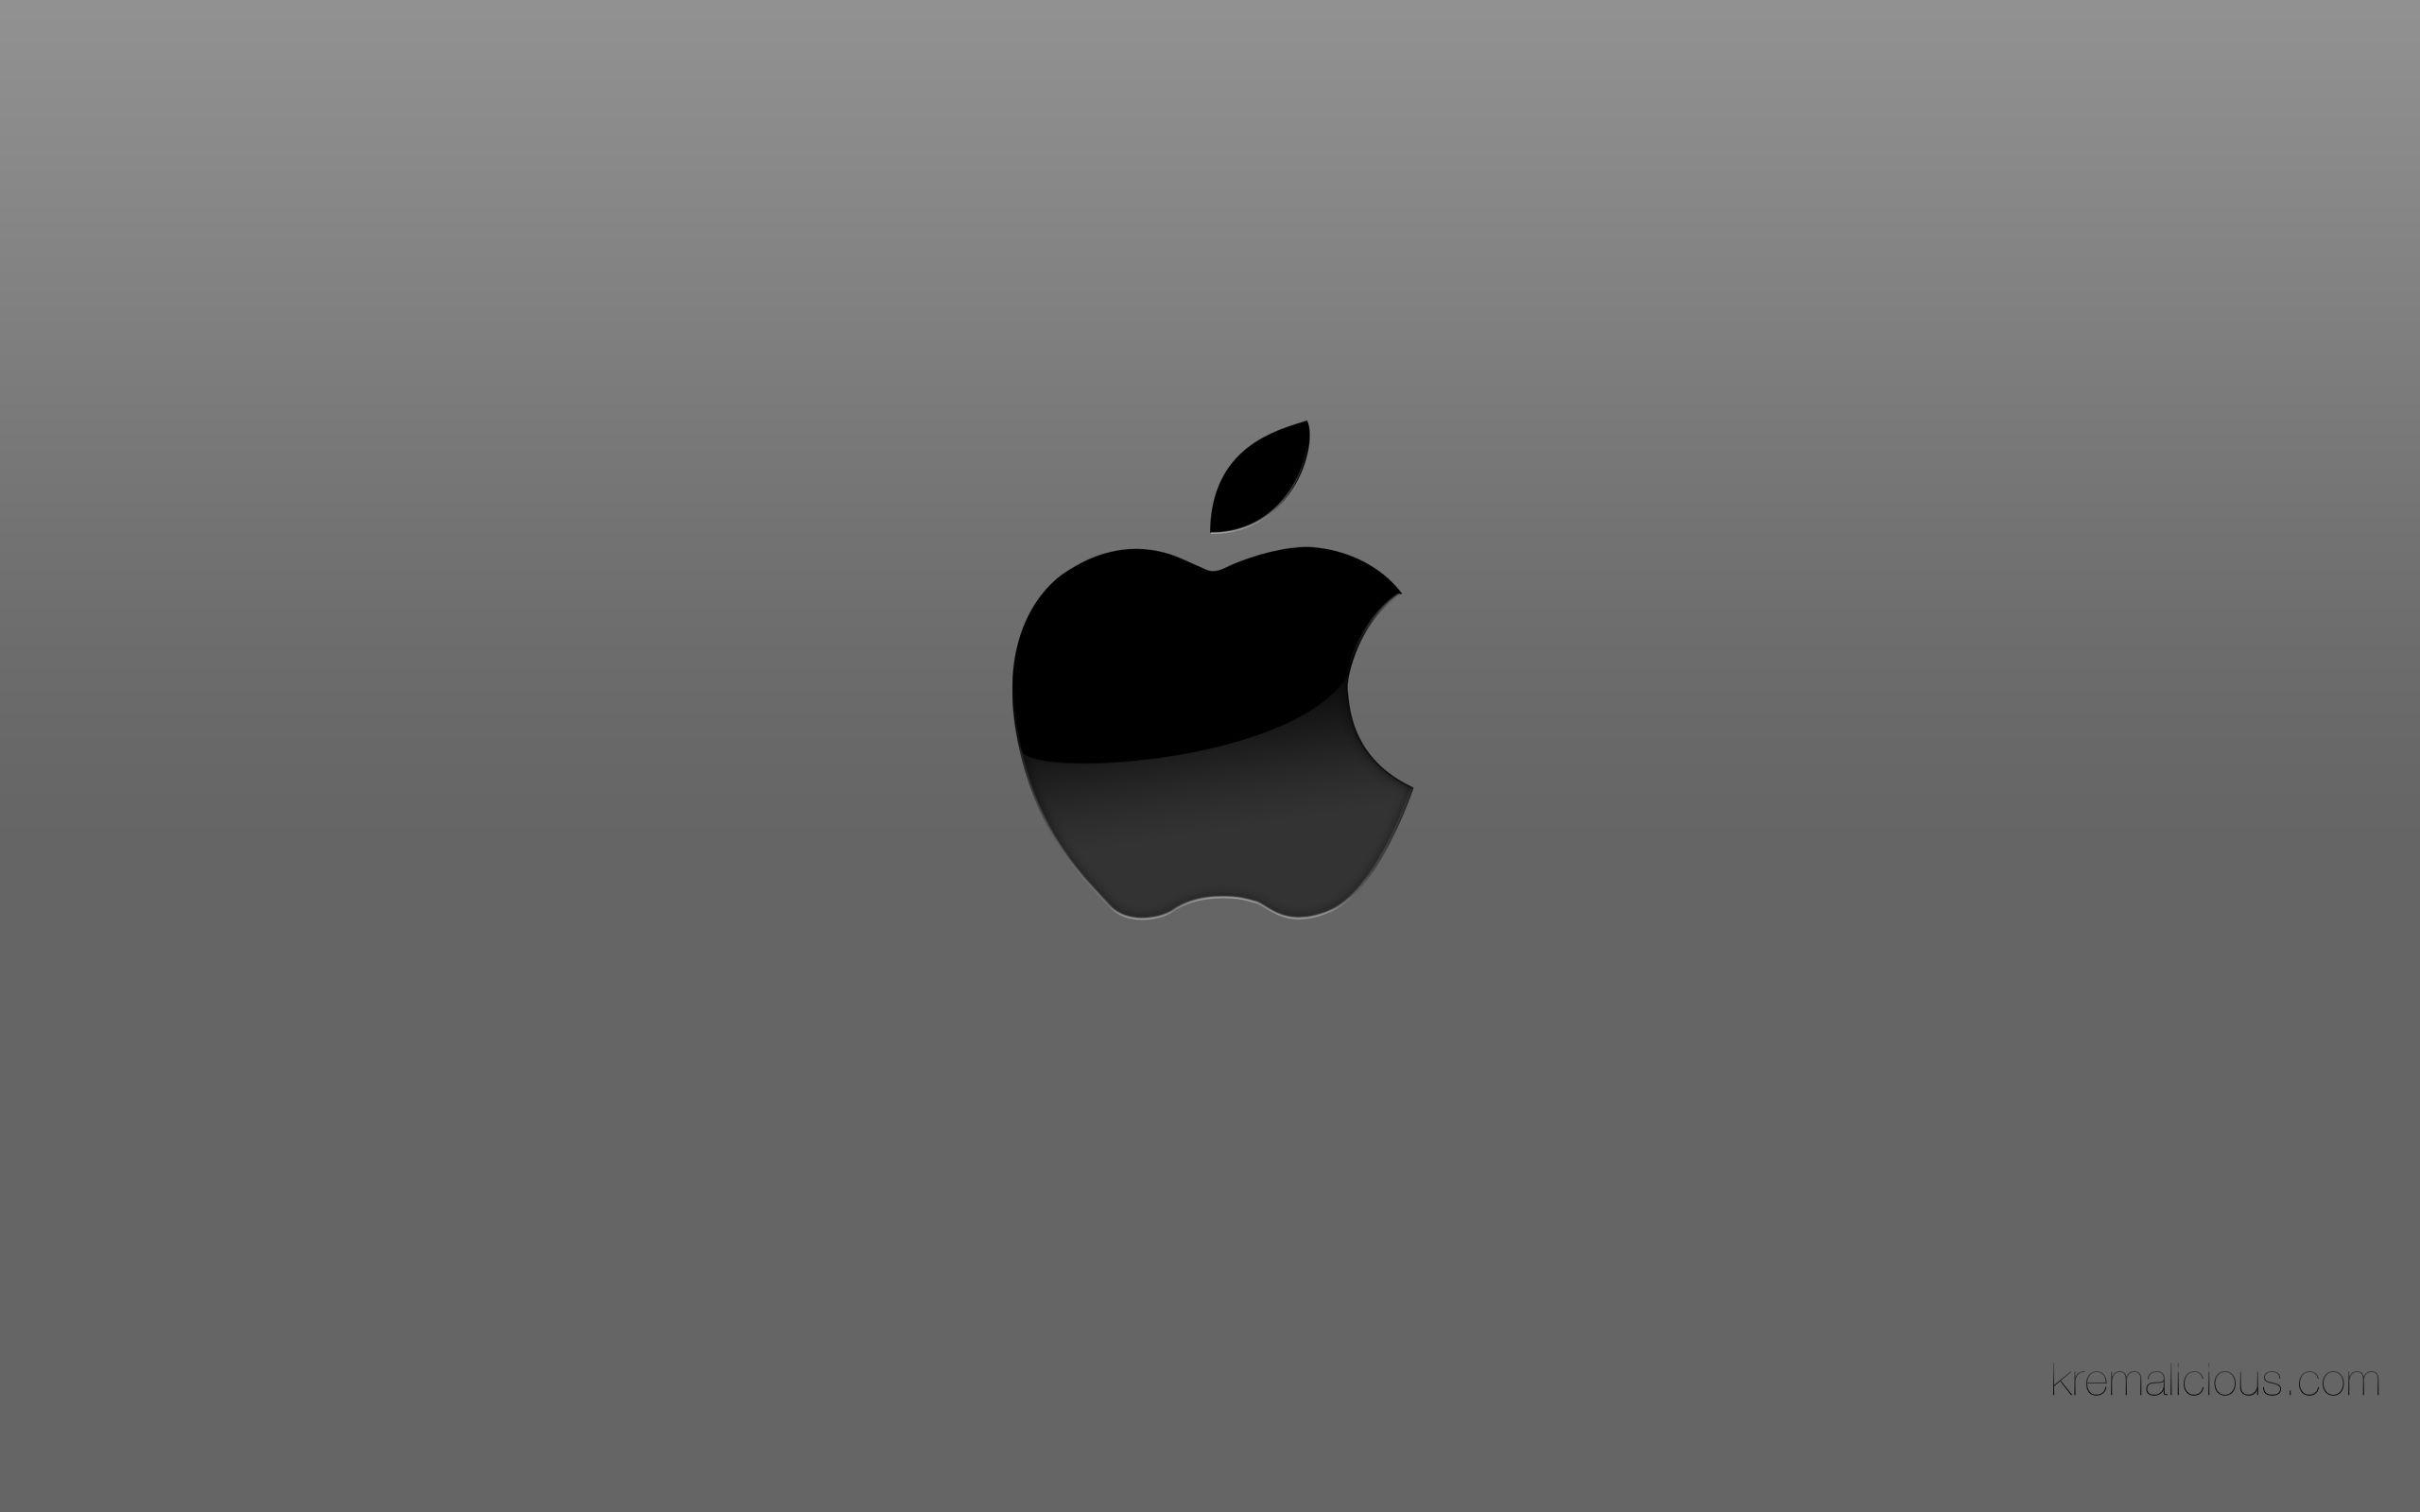 Apple Logo Hd Wallpapers Apple Logo Black Background Hd 2560x1600 Wallpaper Teahub Io